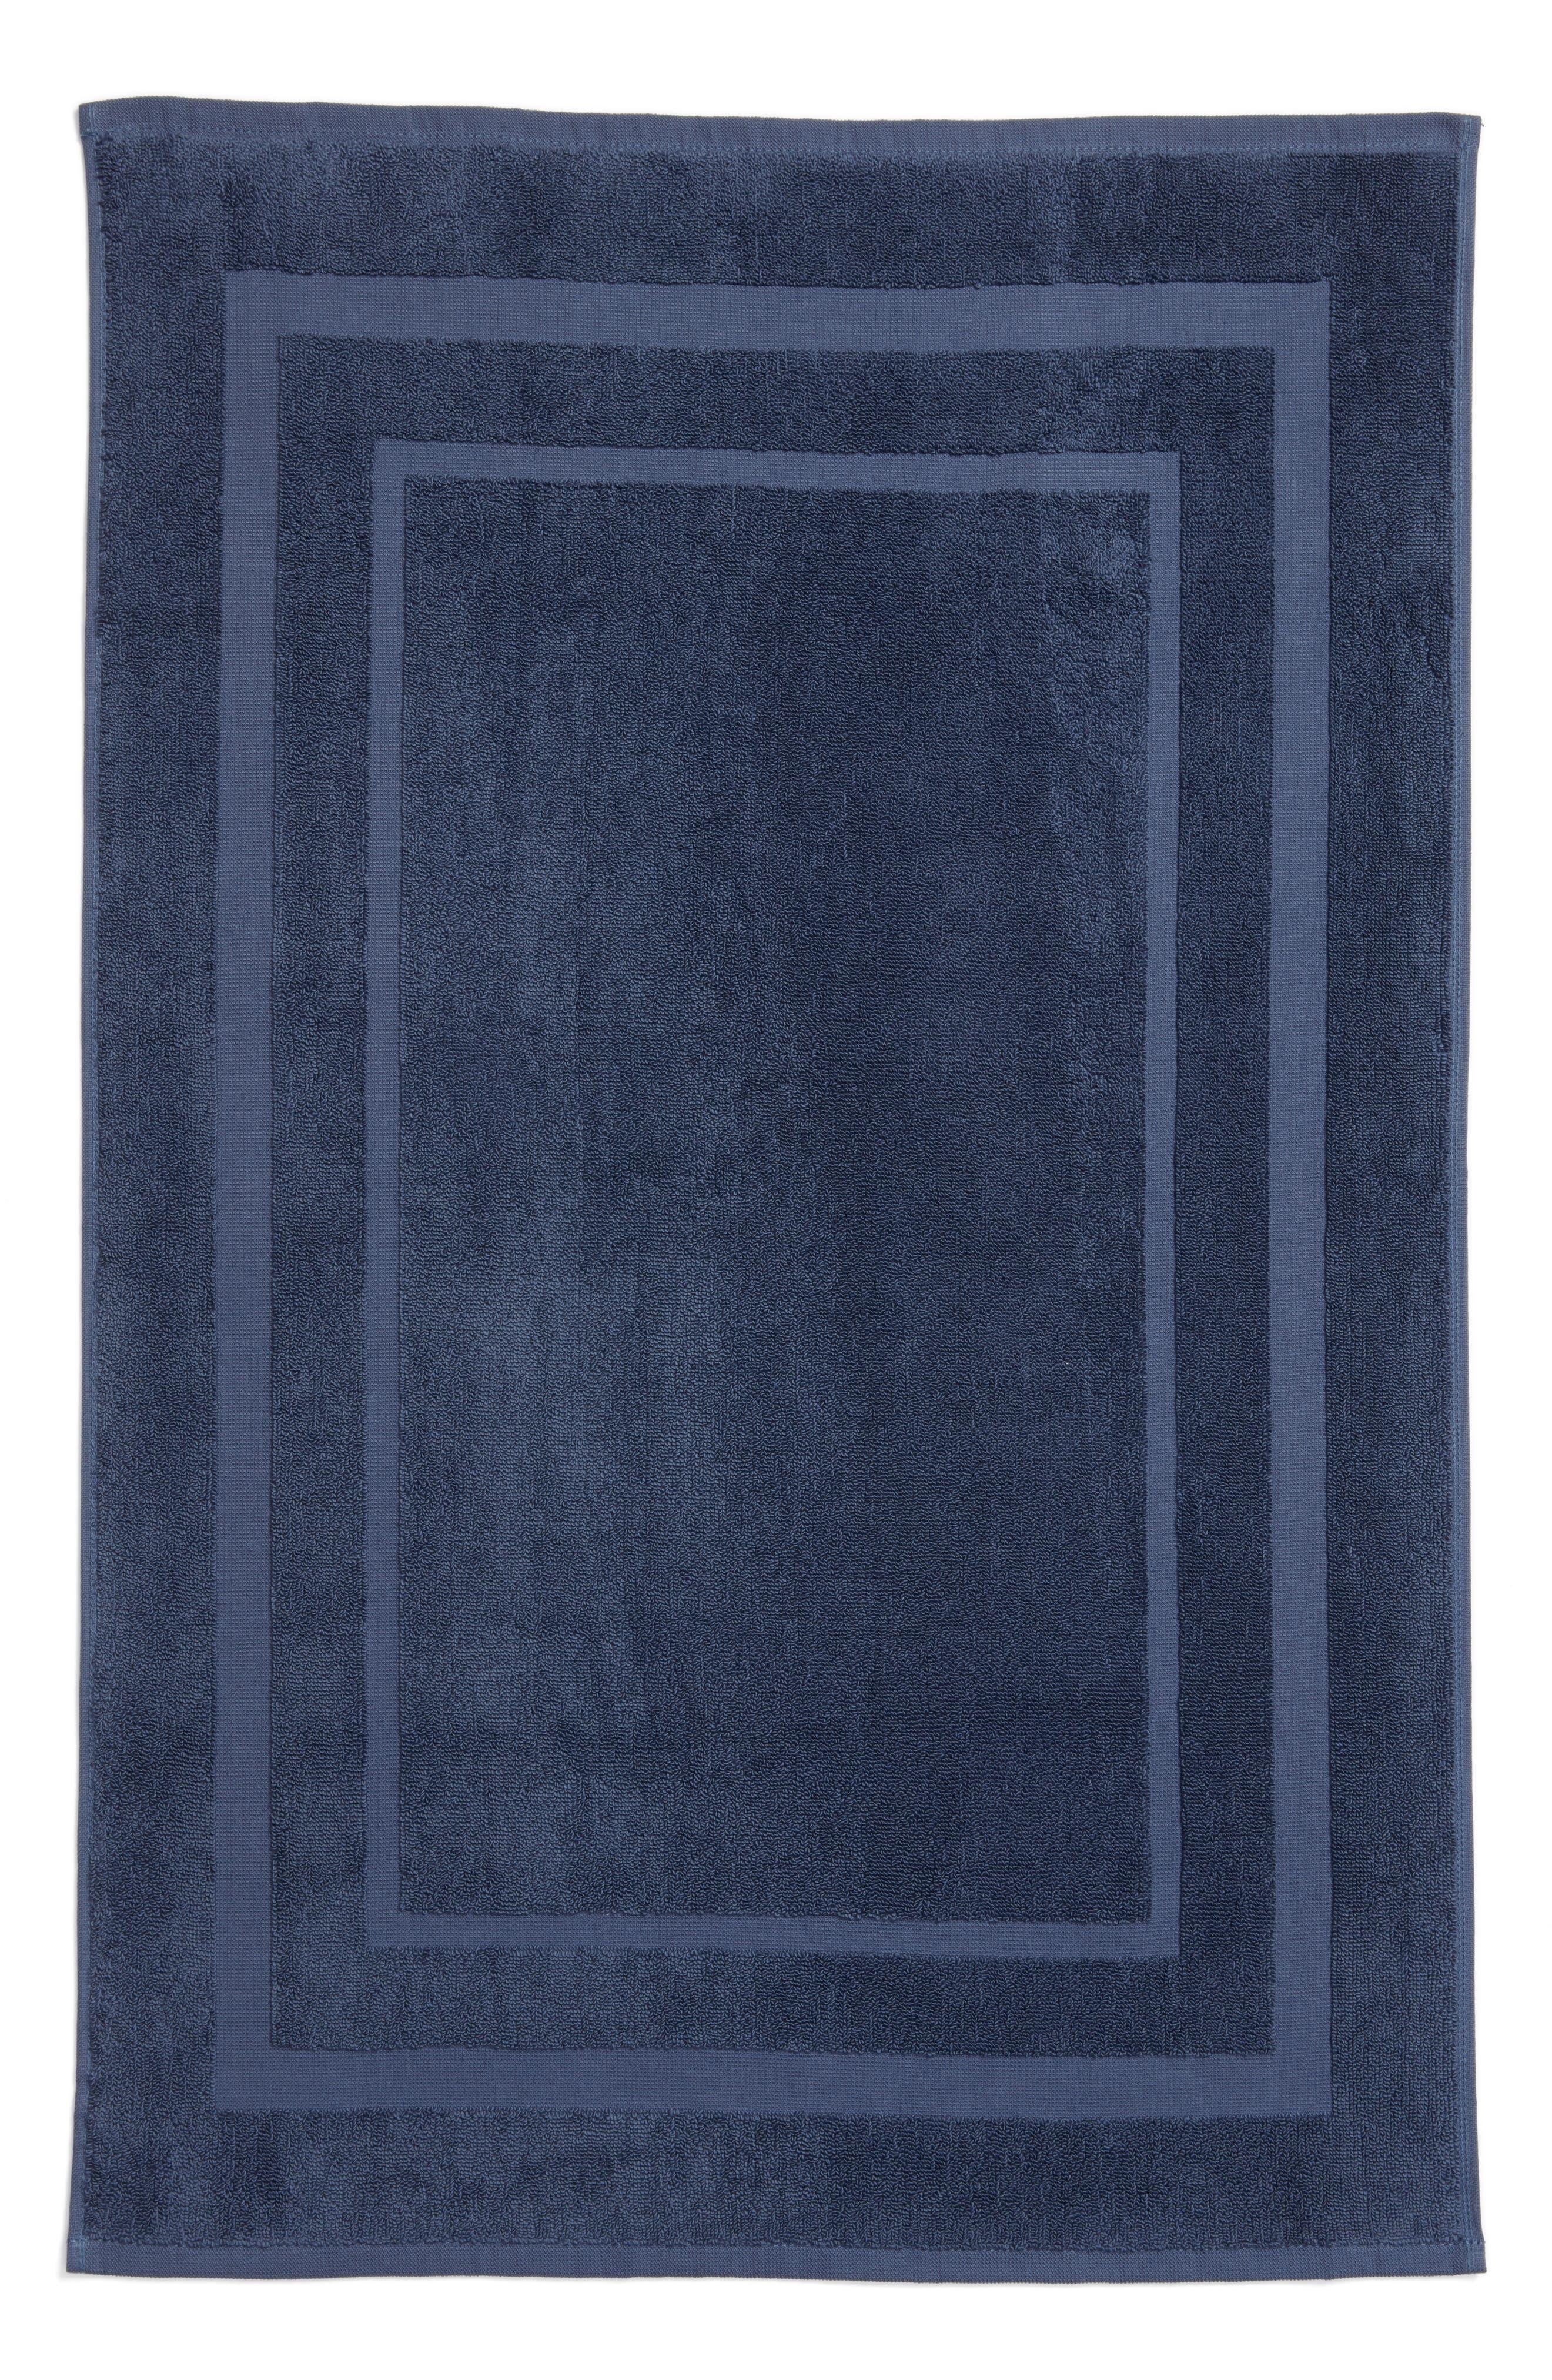 Studio 'Perennial' Turkish Cotton Bath Mat,                             Main thumbnail 1, color,                             INDIGO BLUE